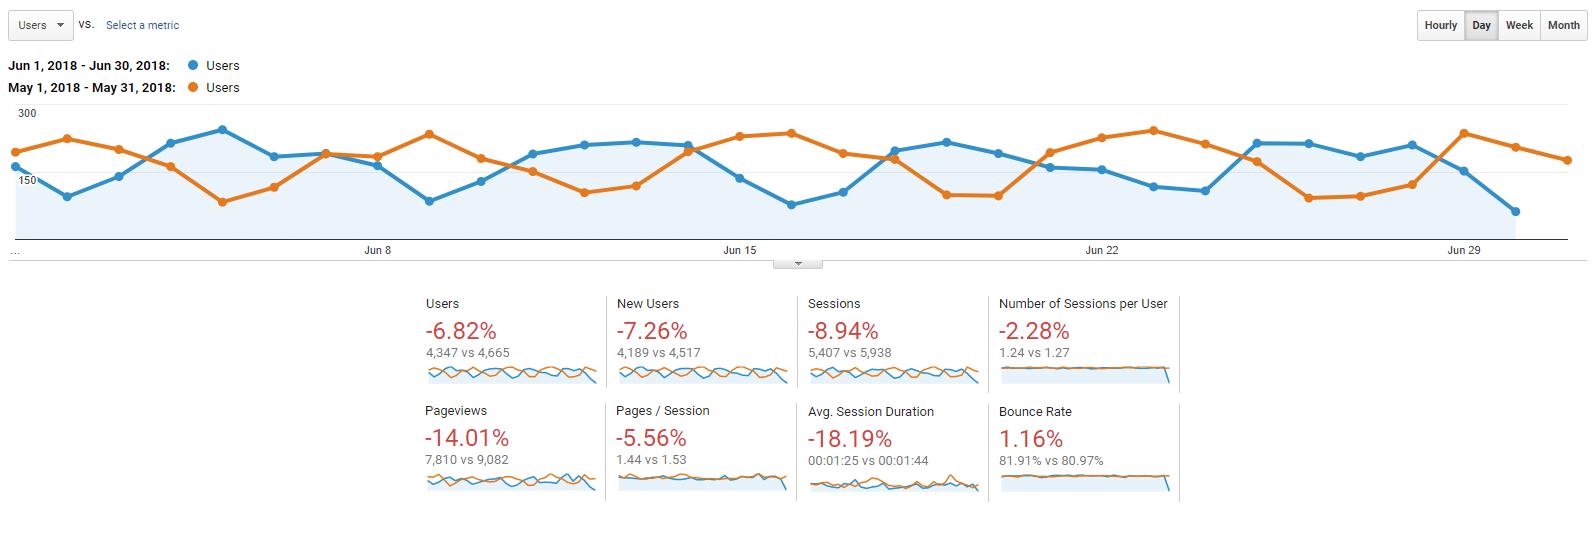 Nonprofits Source - June 2018 Traffic Results